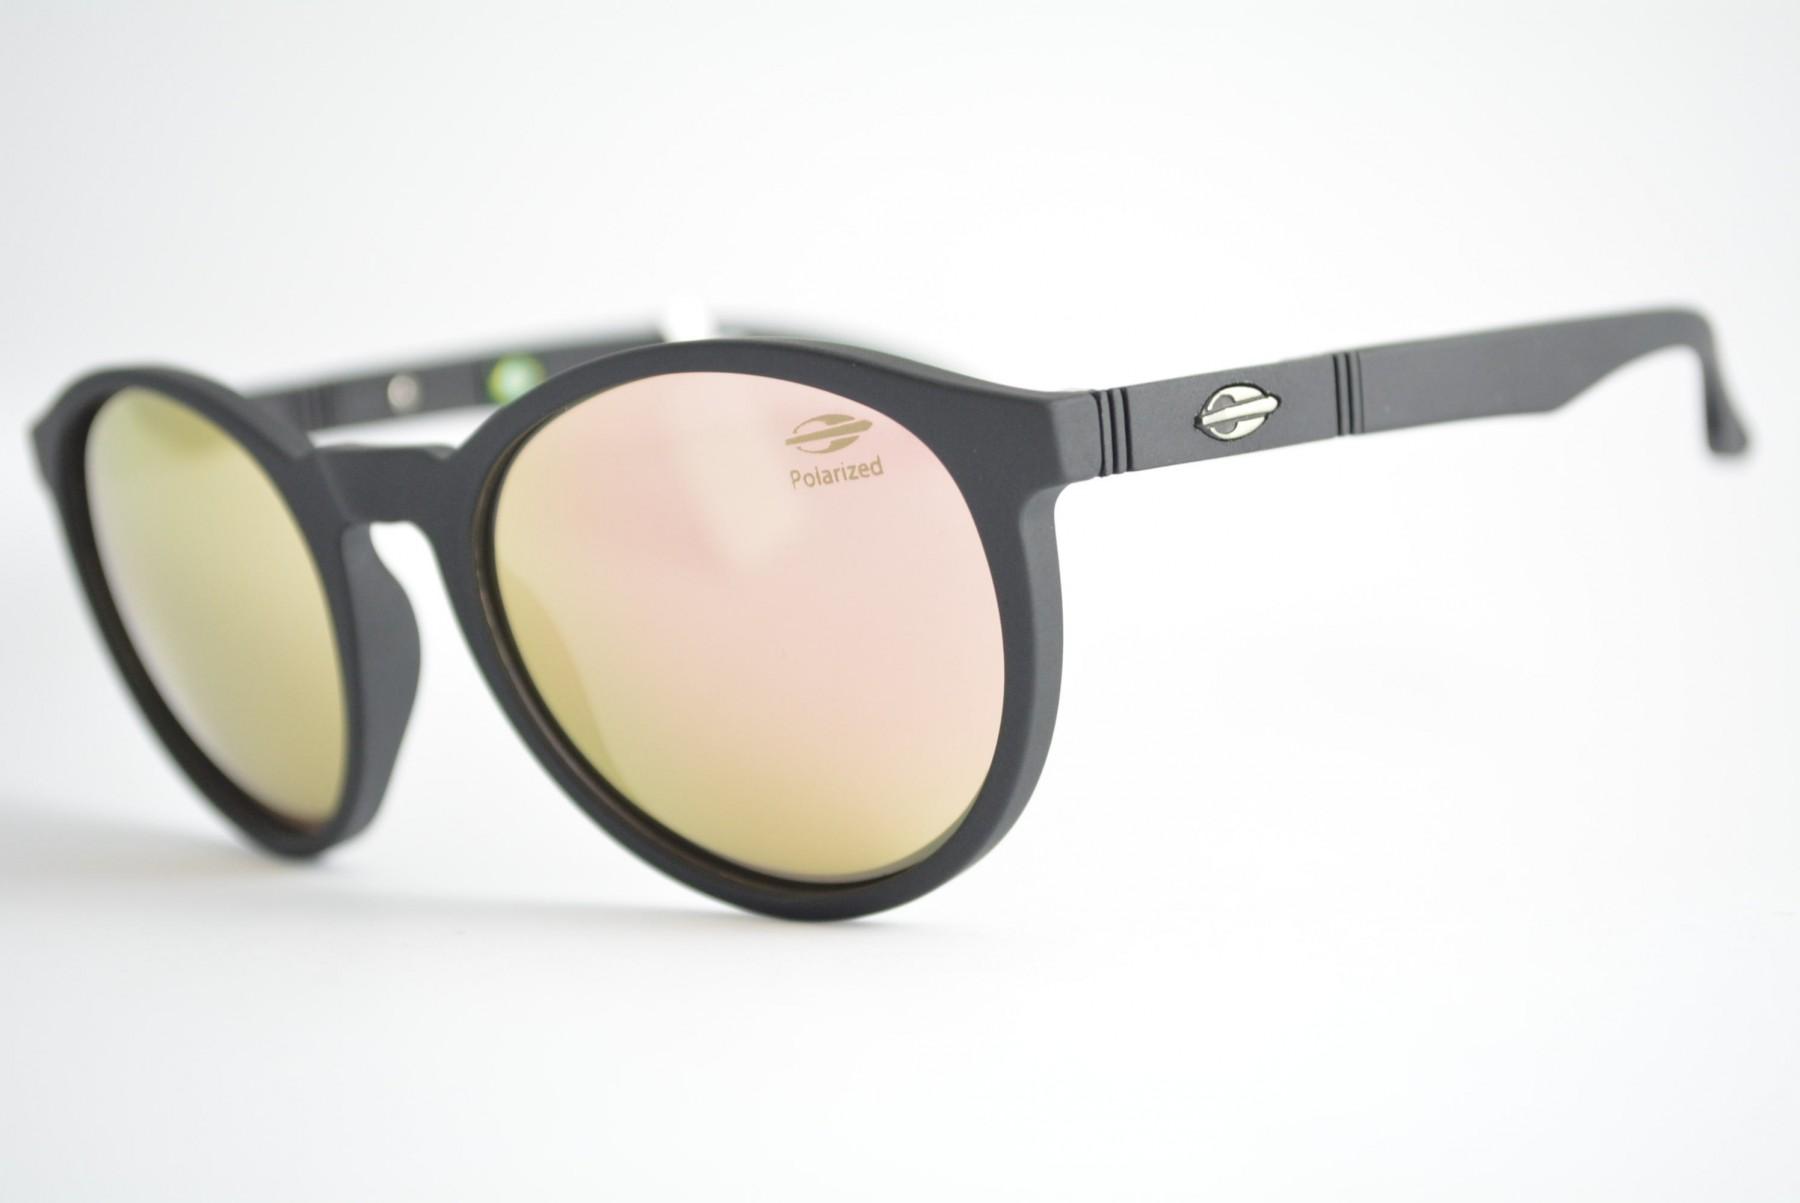 óculos de sol Mormaii mod Maui NXT m0072 a14 Infantil. Código  maui nxt  m0072 a14 dc12f674a8